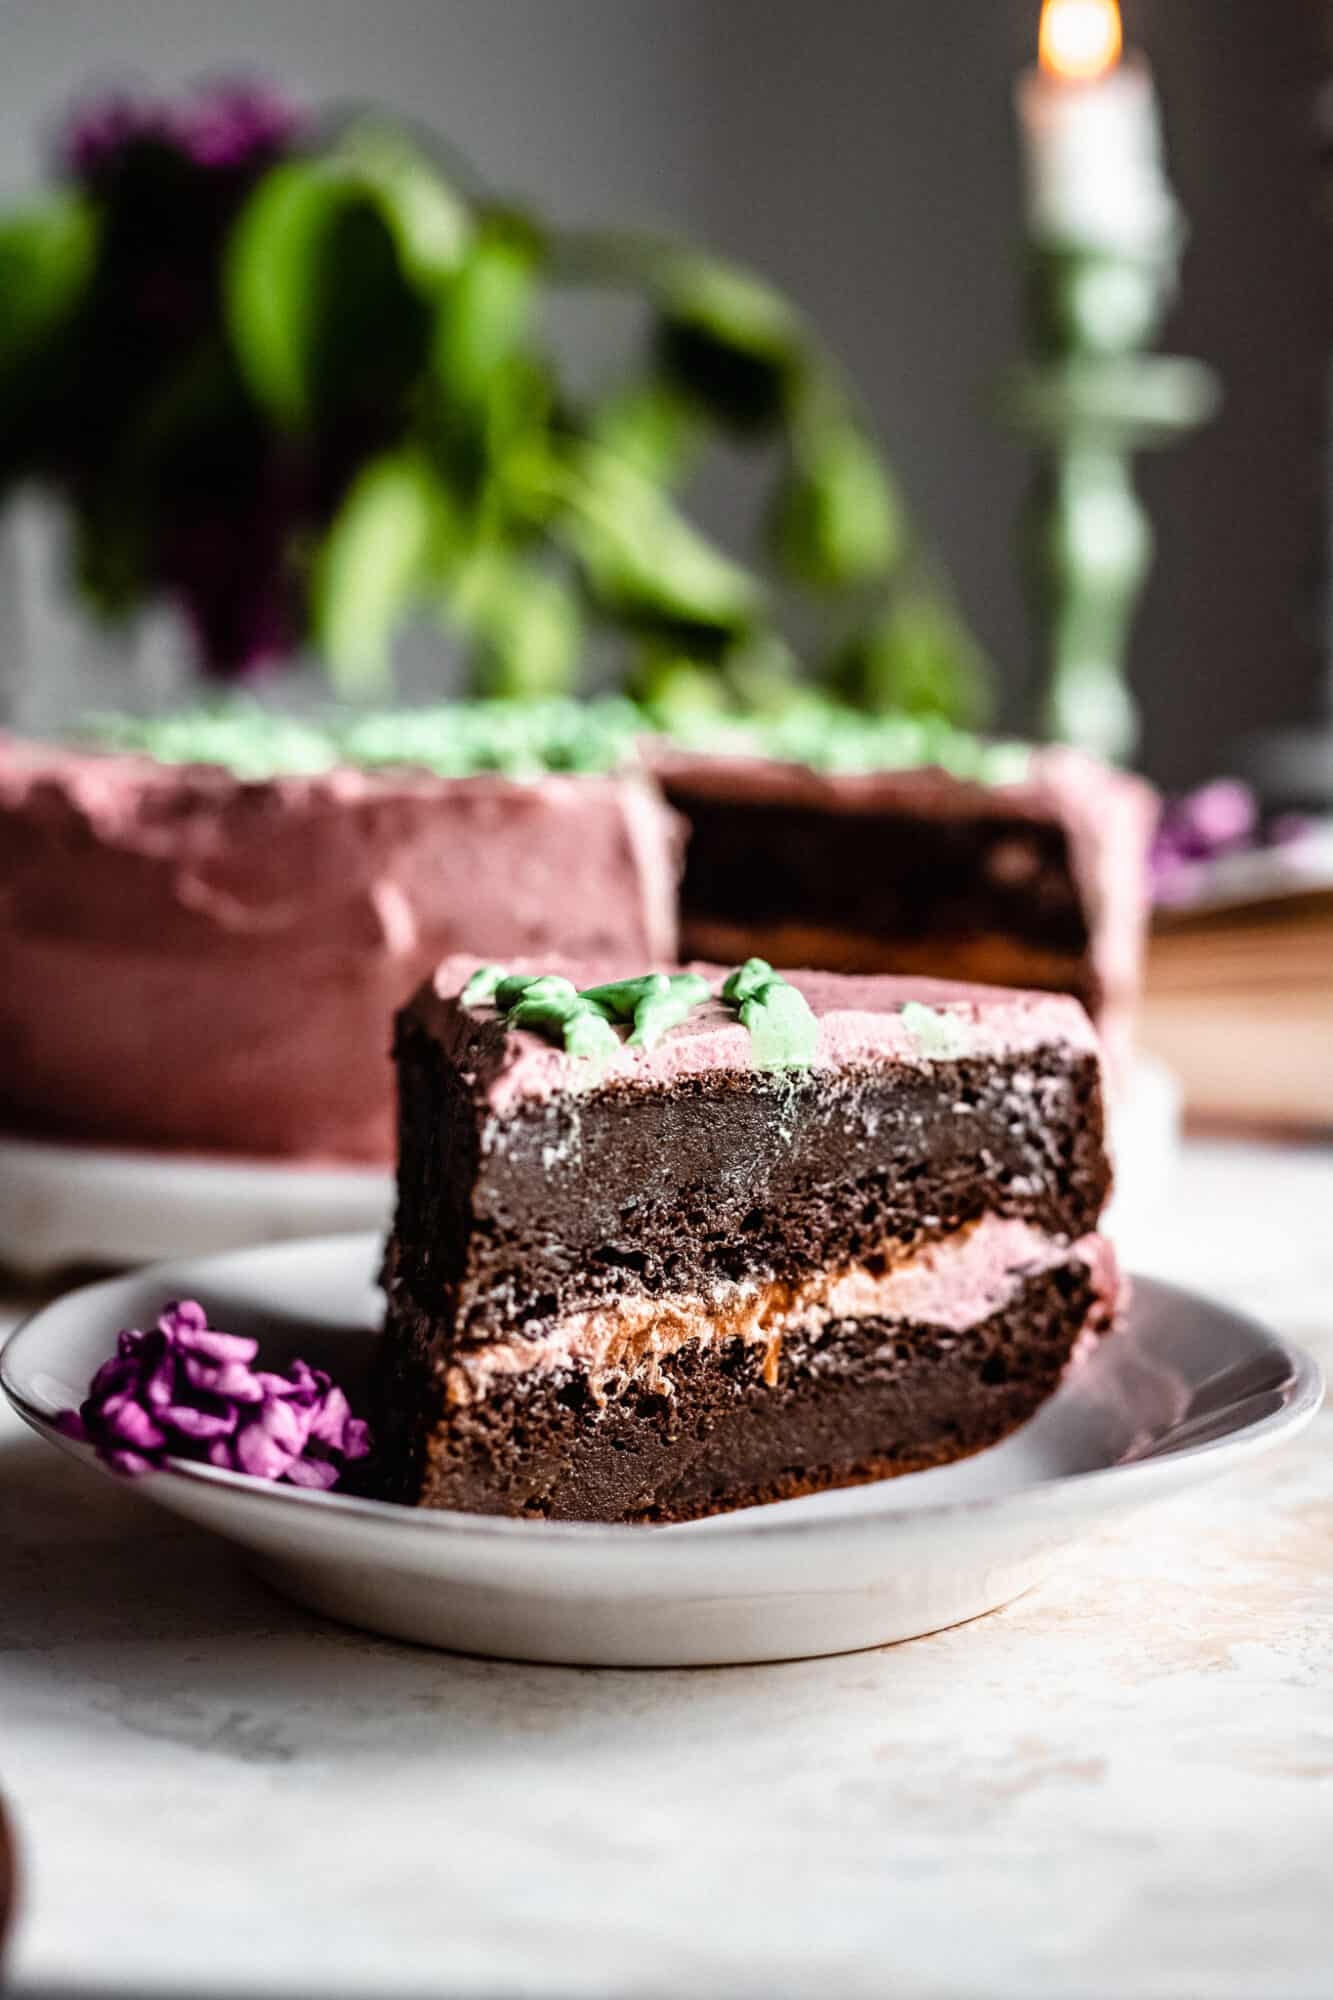 slice of vegan chocolate caramel cake